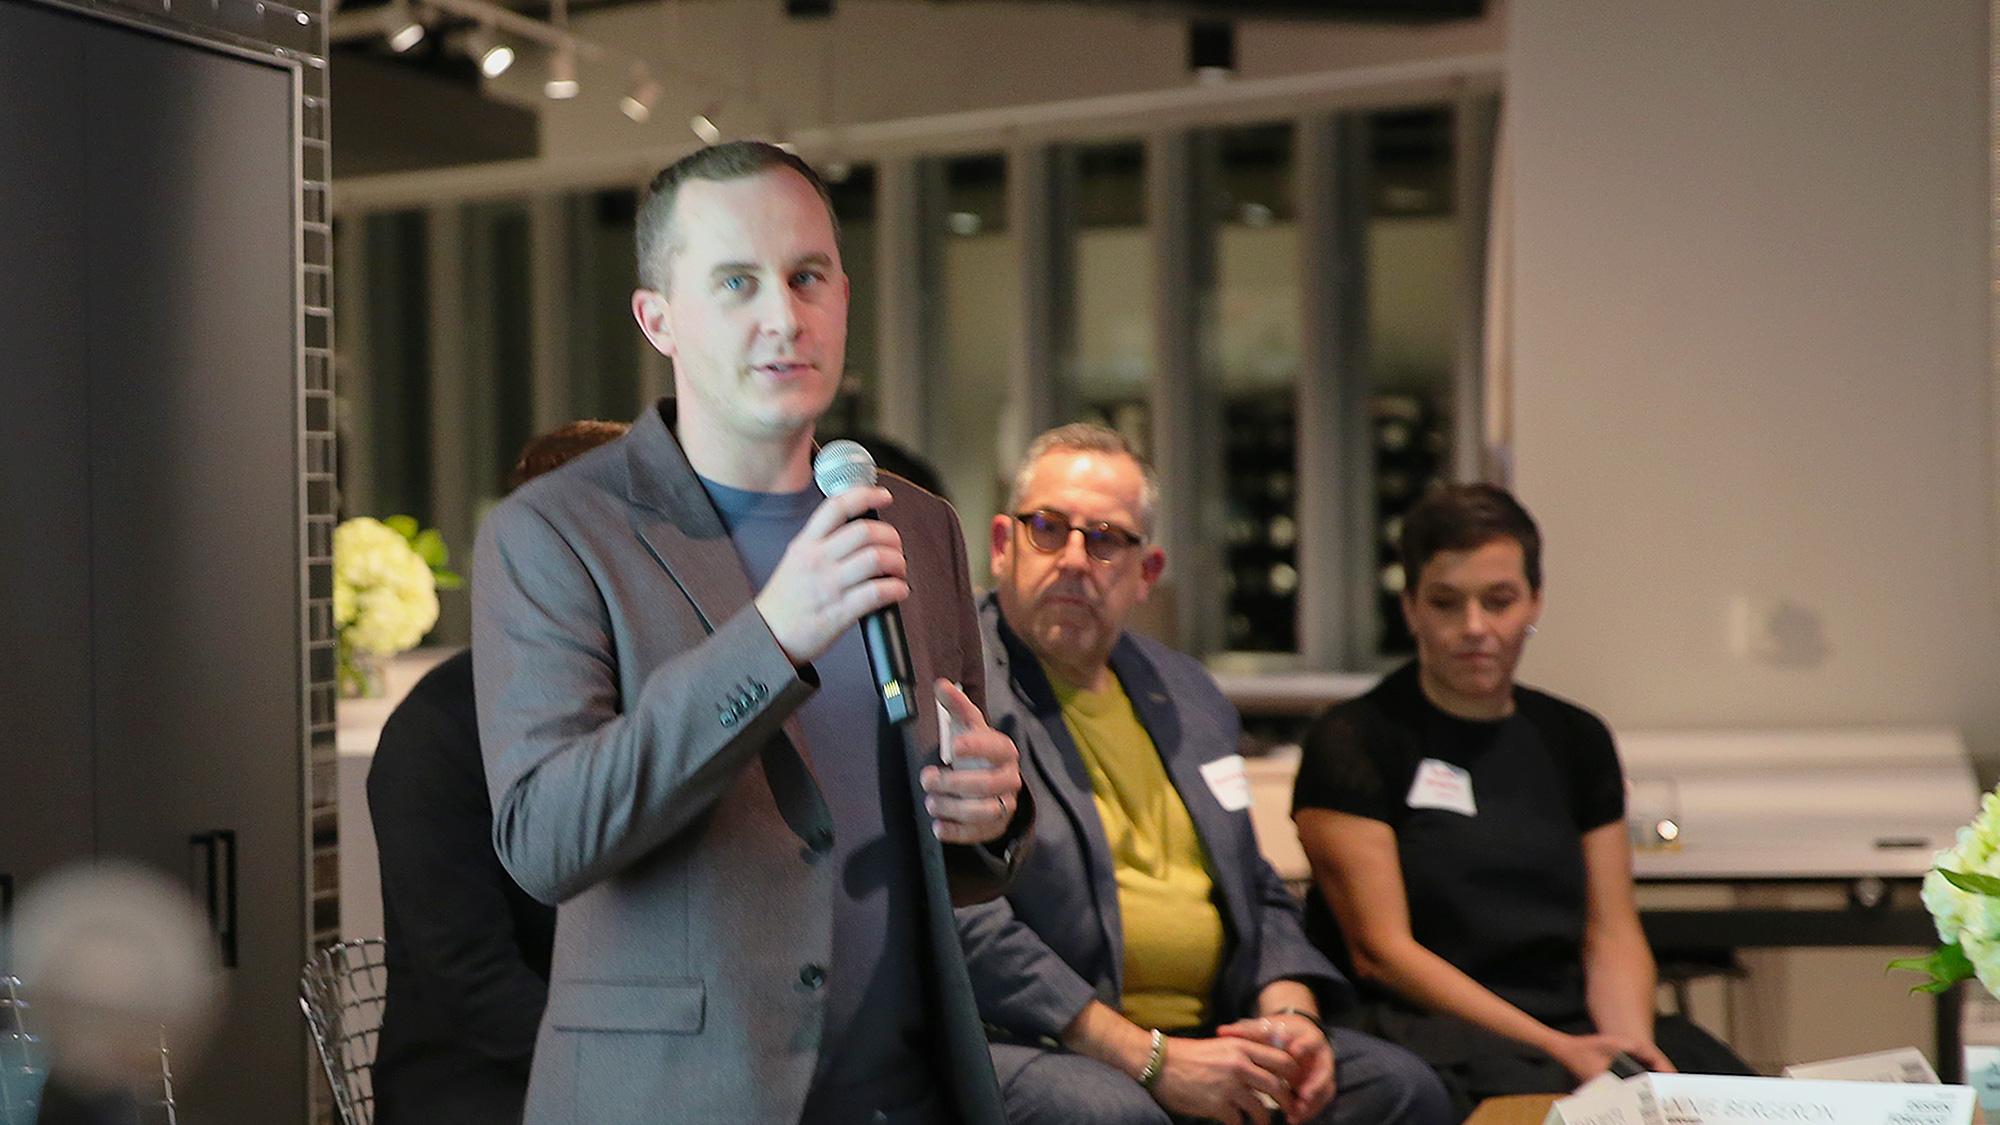 Gensler's Steven Paynter presents at Gensler Toronto's Design Forecast Local event